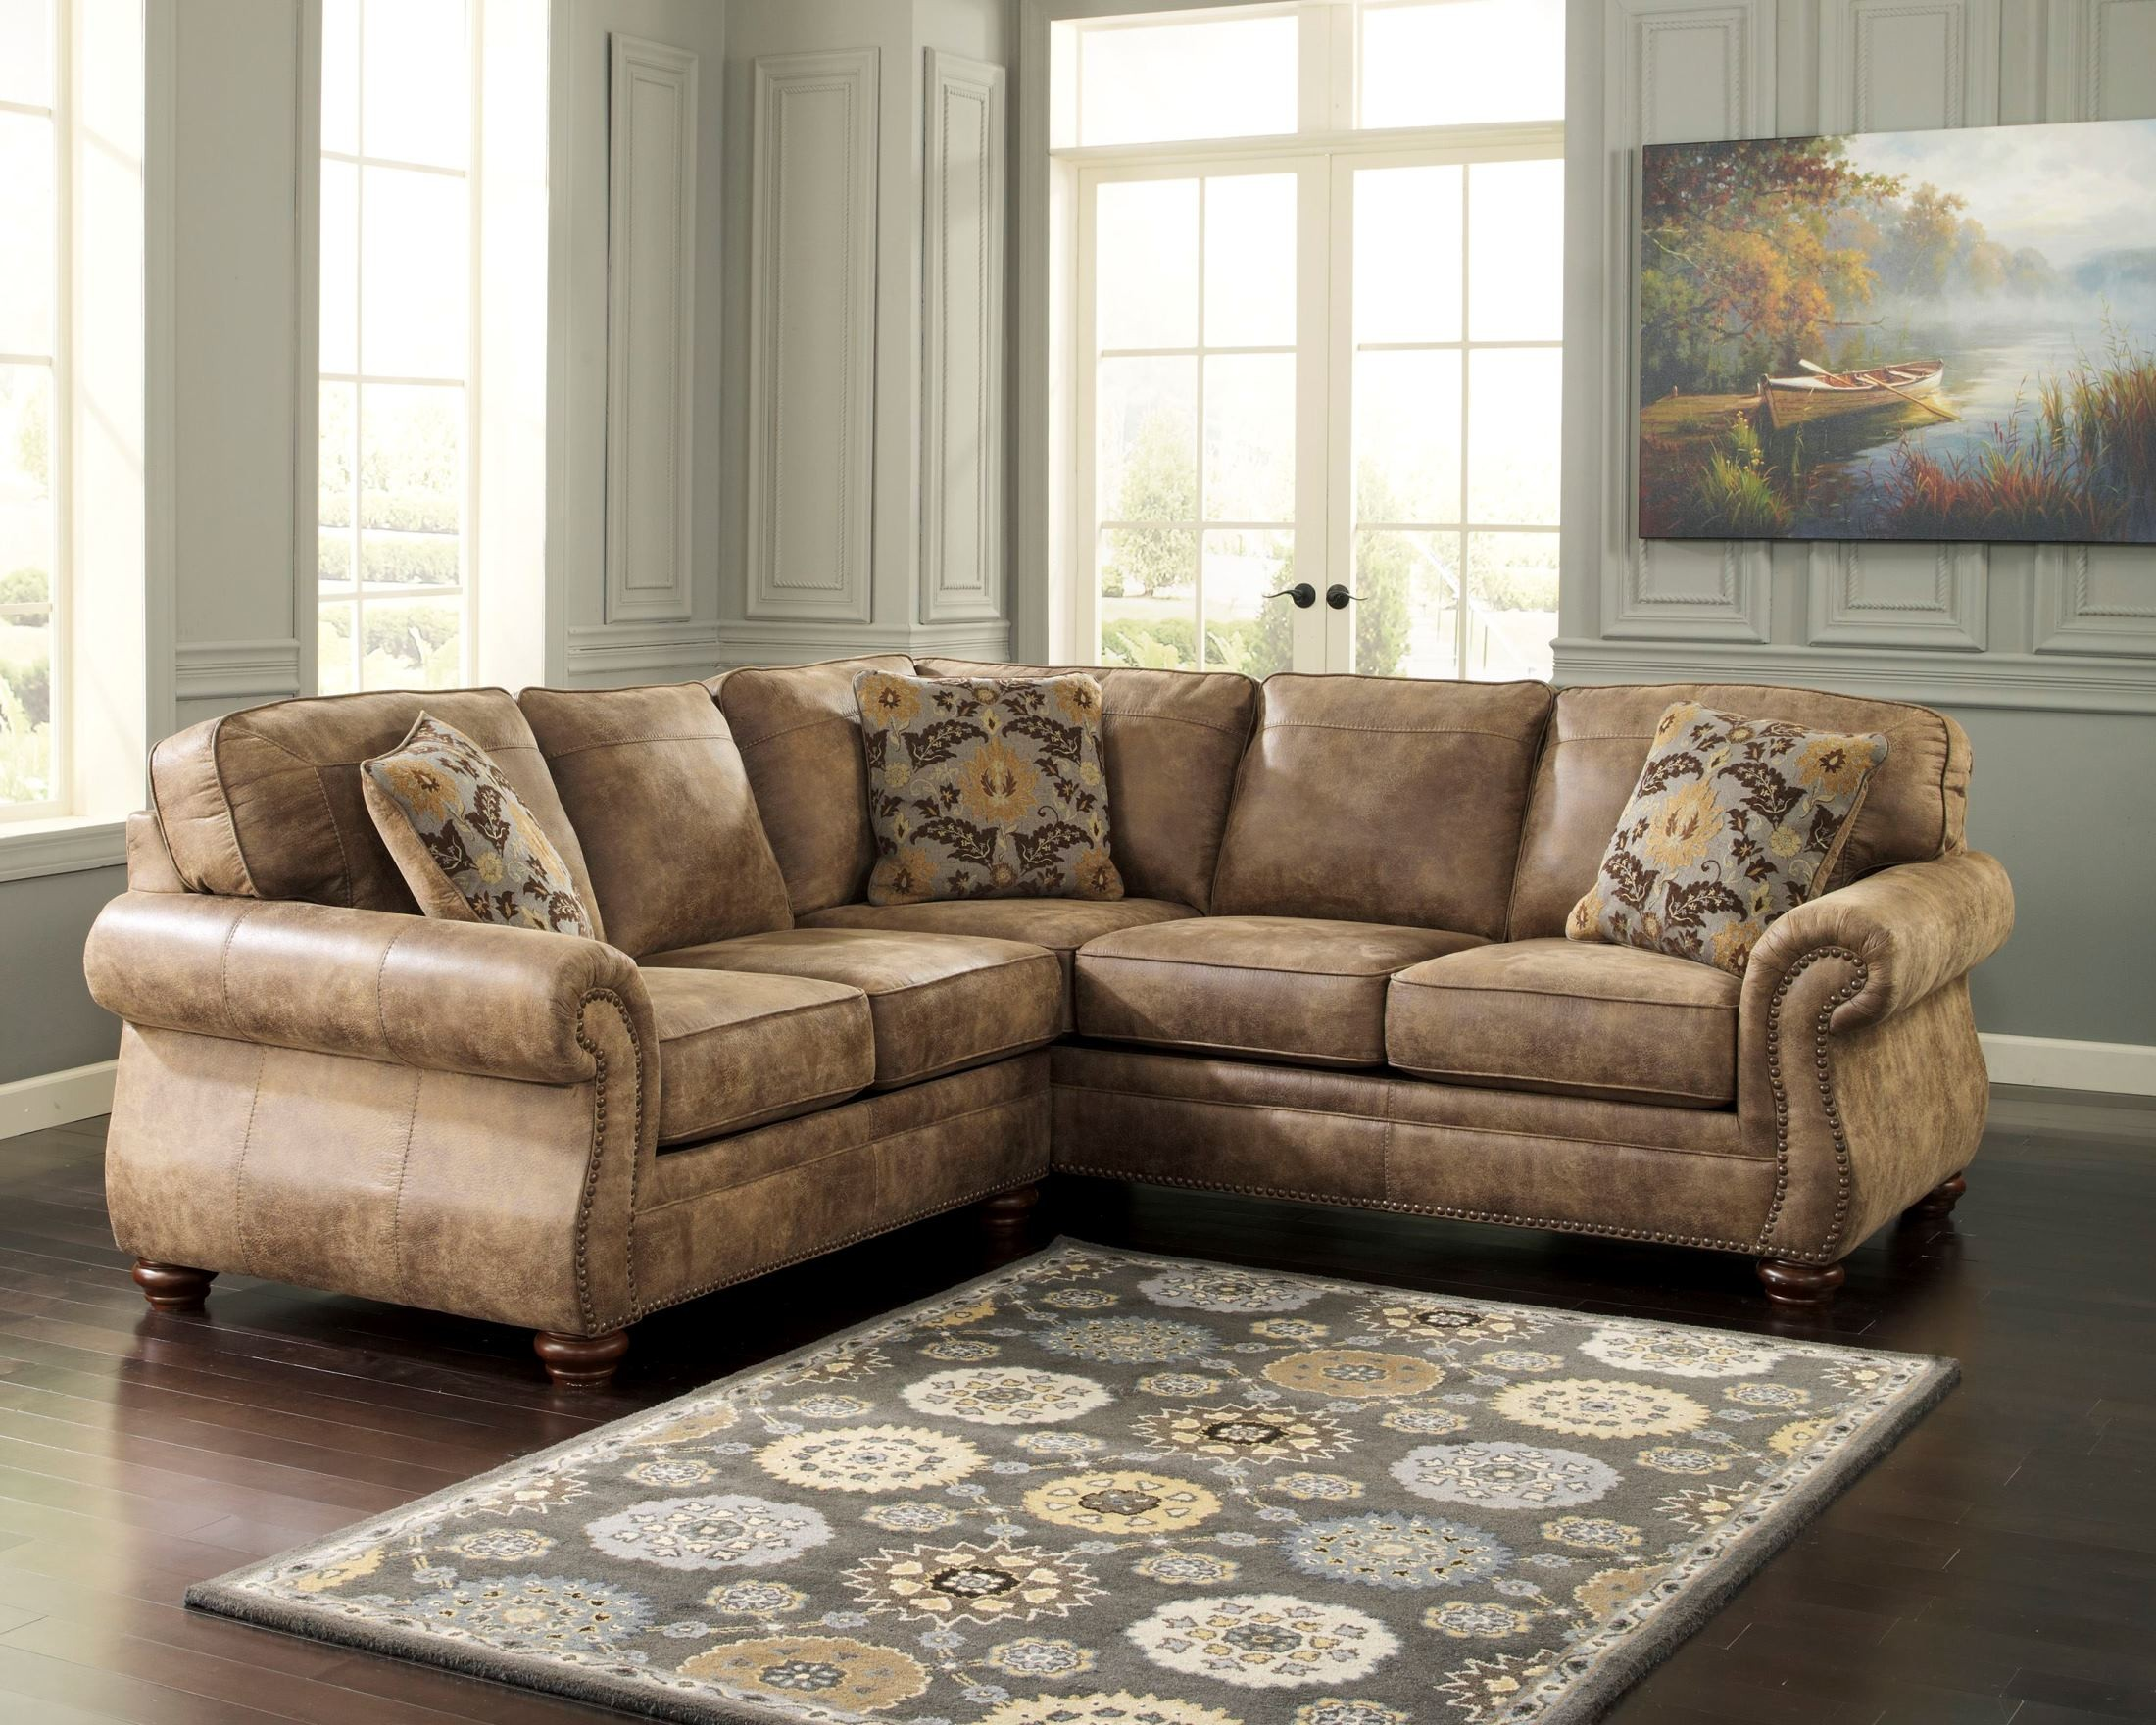 Ashley Furniture Tampa Bay South Florida Furniture Retailer City - Ashley furniture tampa